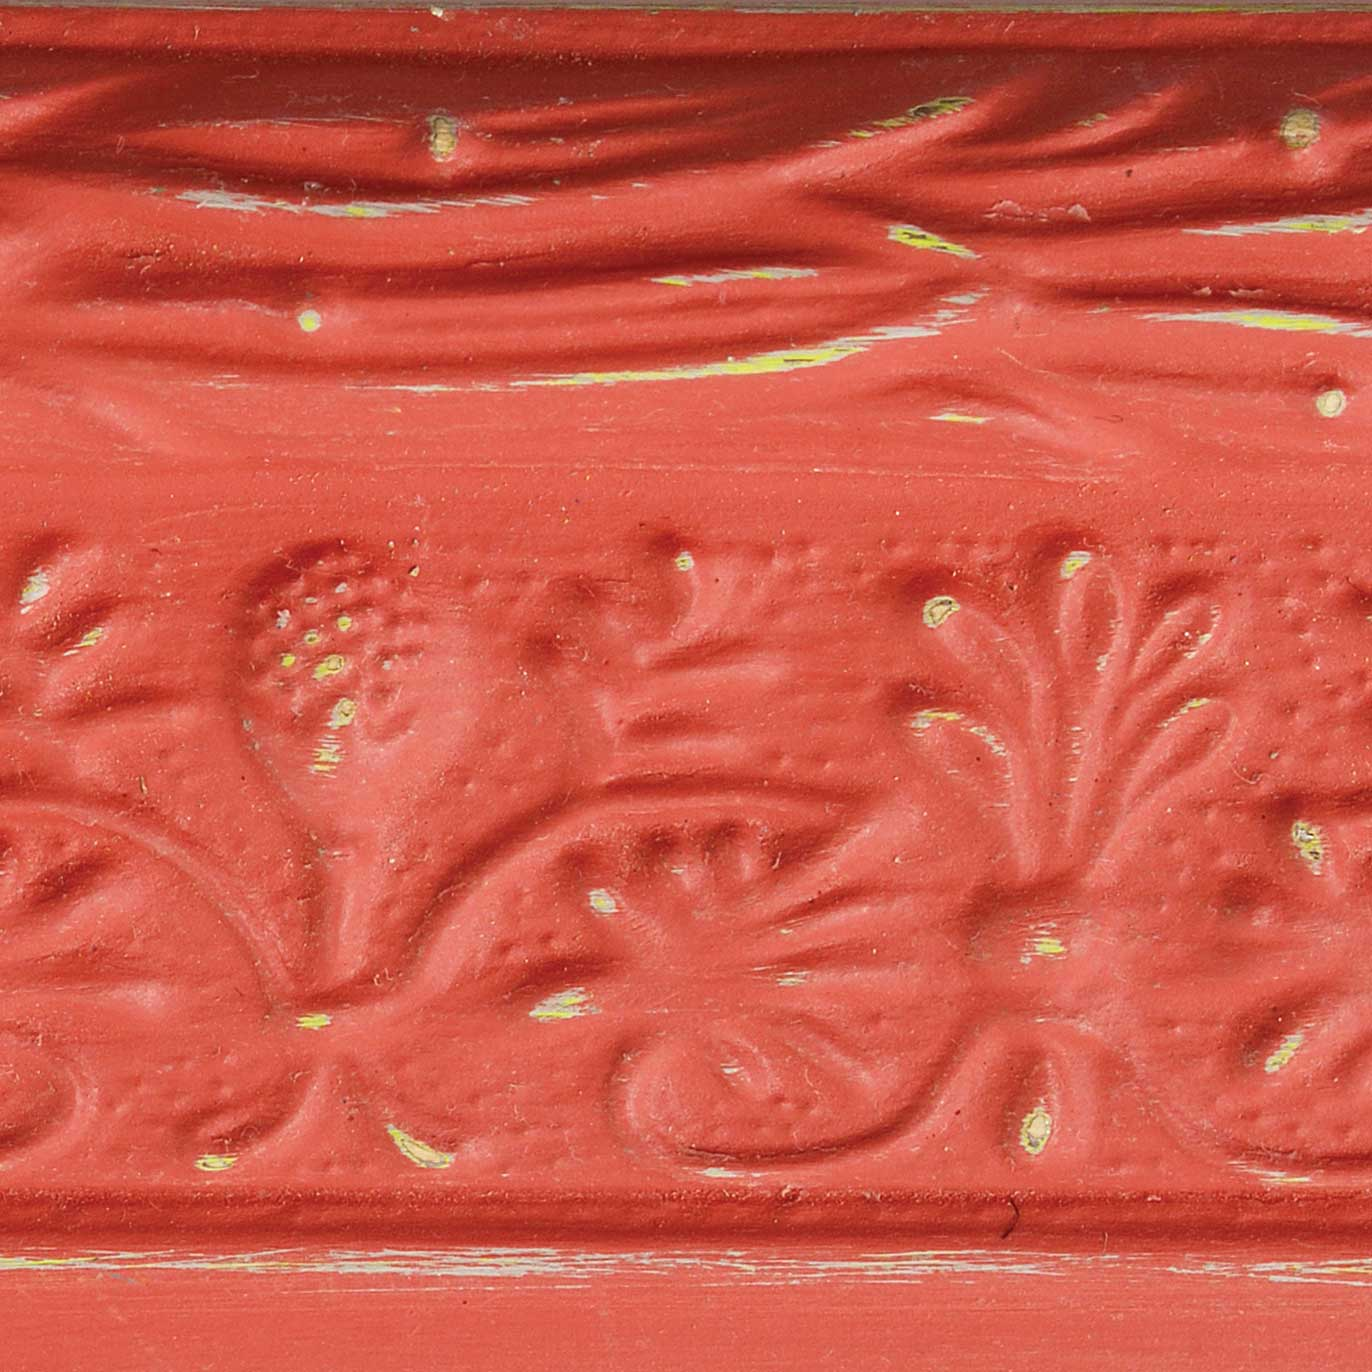 FolkArt ® Home Decor™ Chalk - Salmon Coral, 8 oz. - 34154